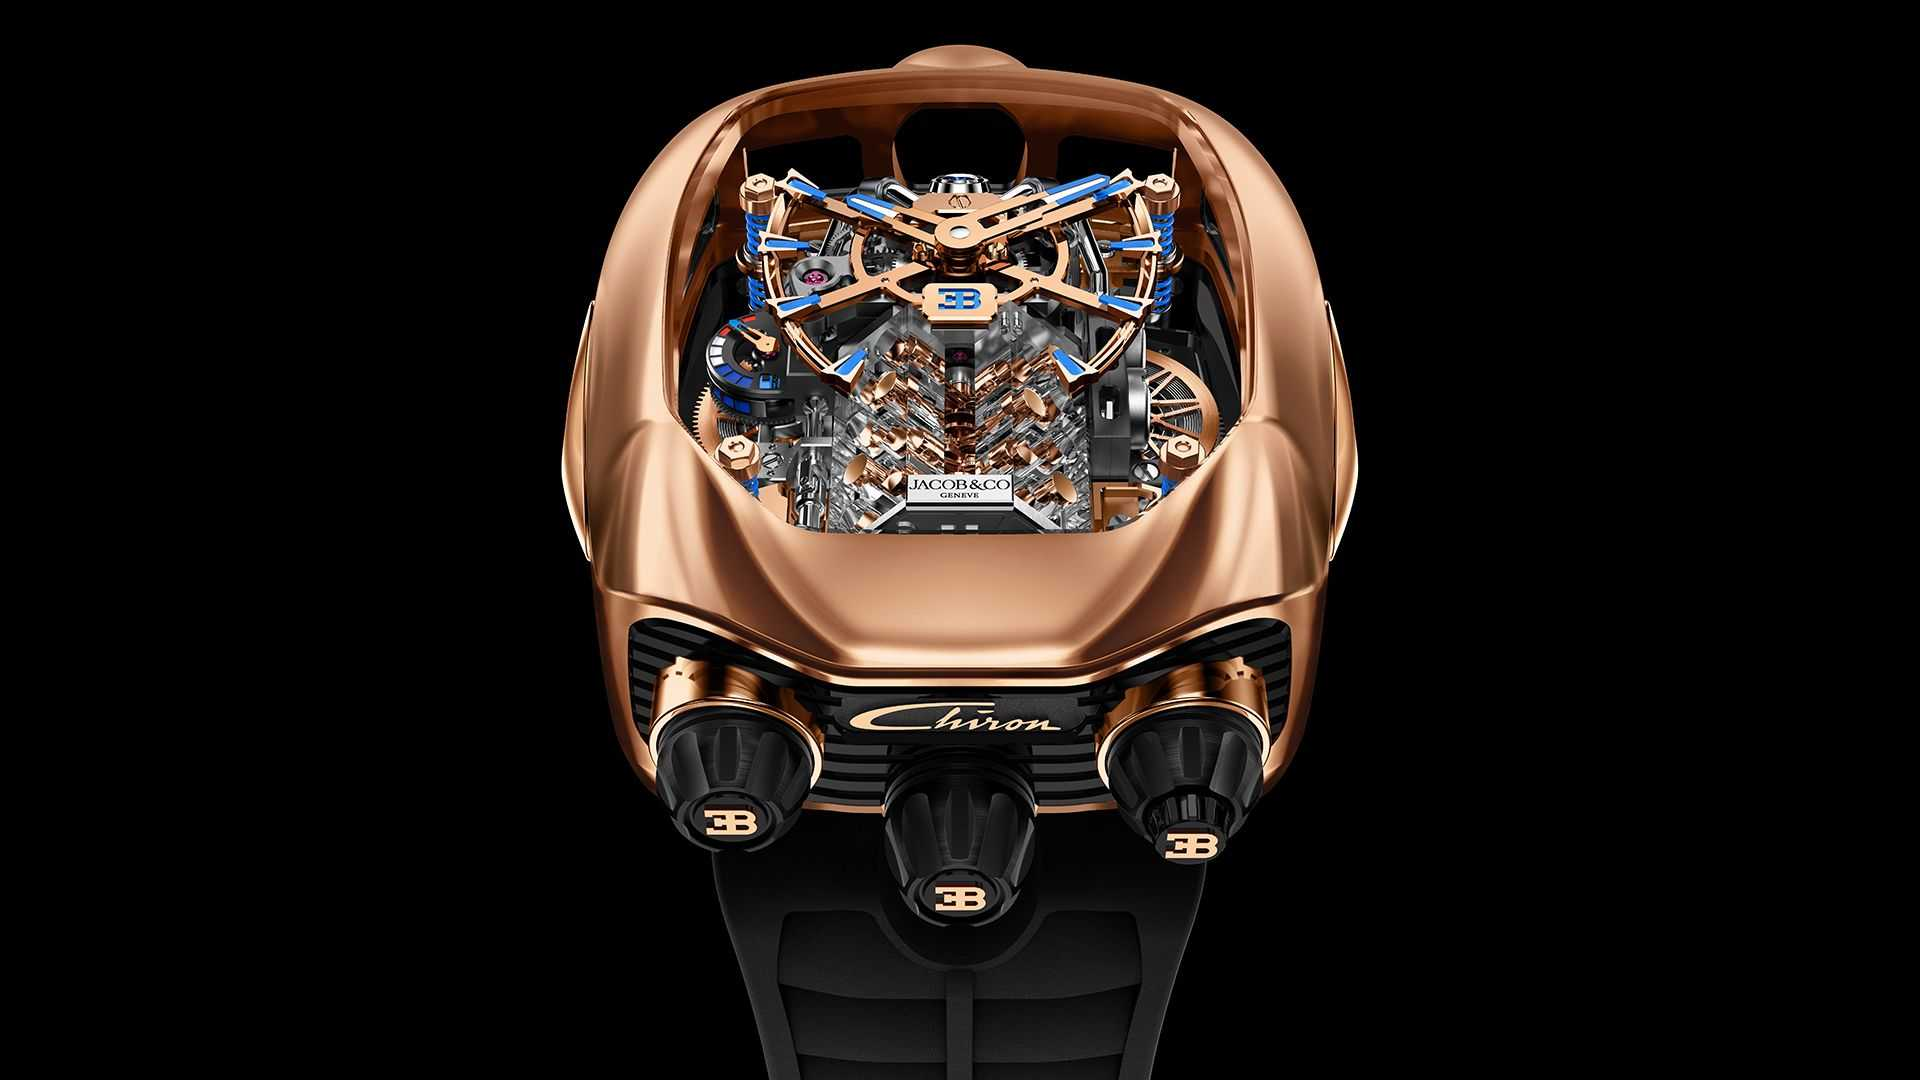 Jacob-Co-Bugatti-Chiron-Tourbillon-Watch-4